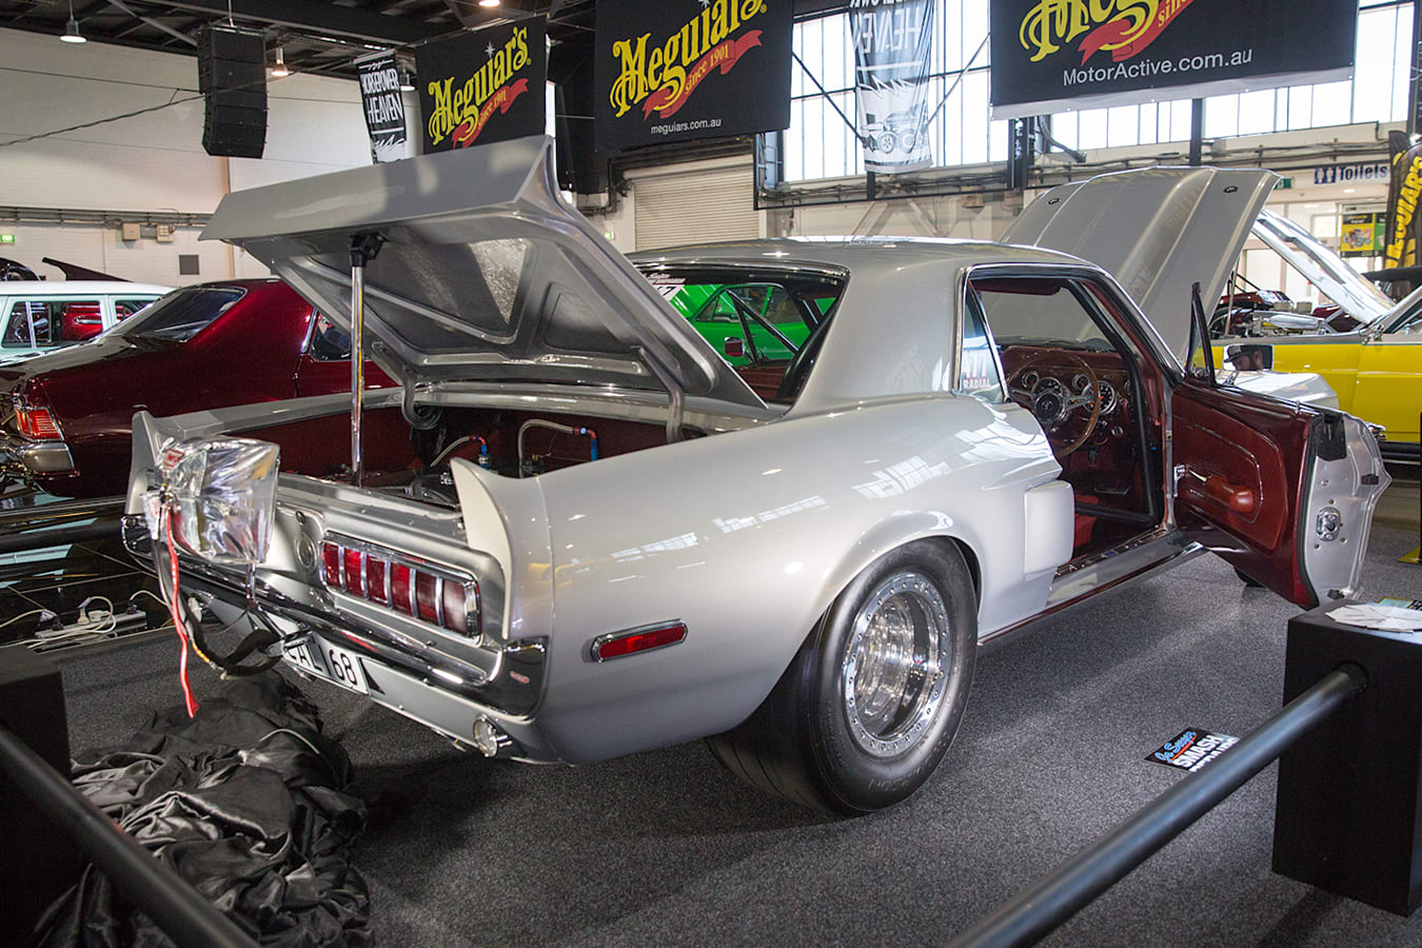 Mustang Top 60 Meguiars Reveal Summernats Jpg